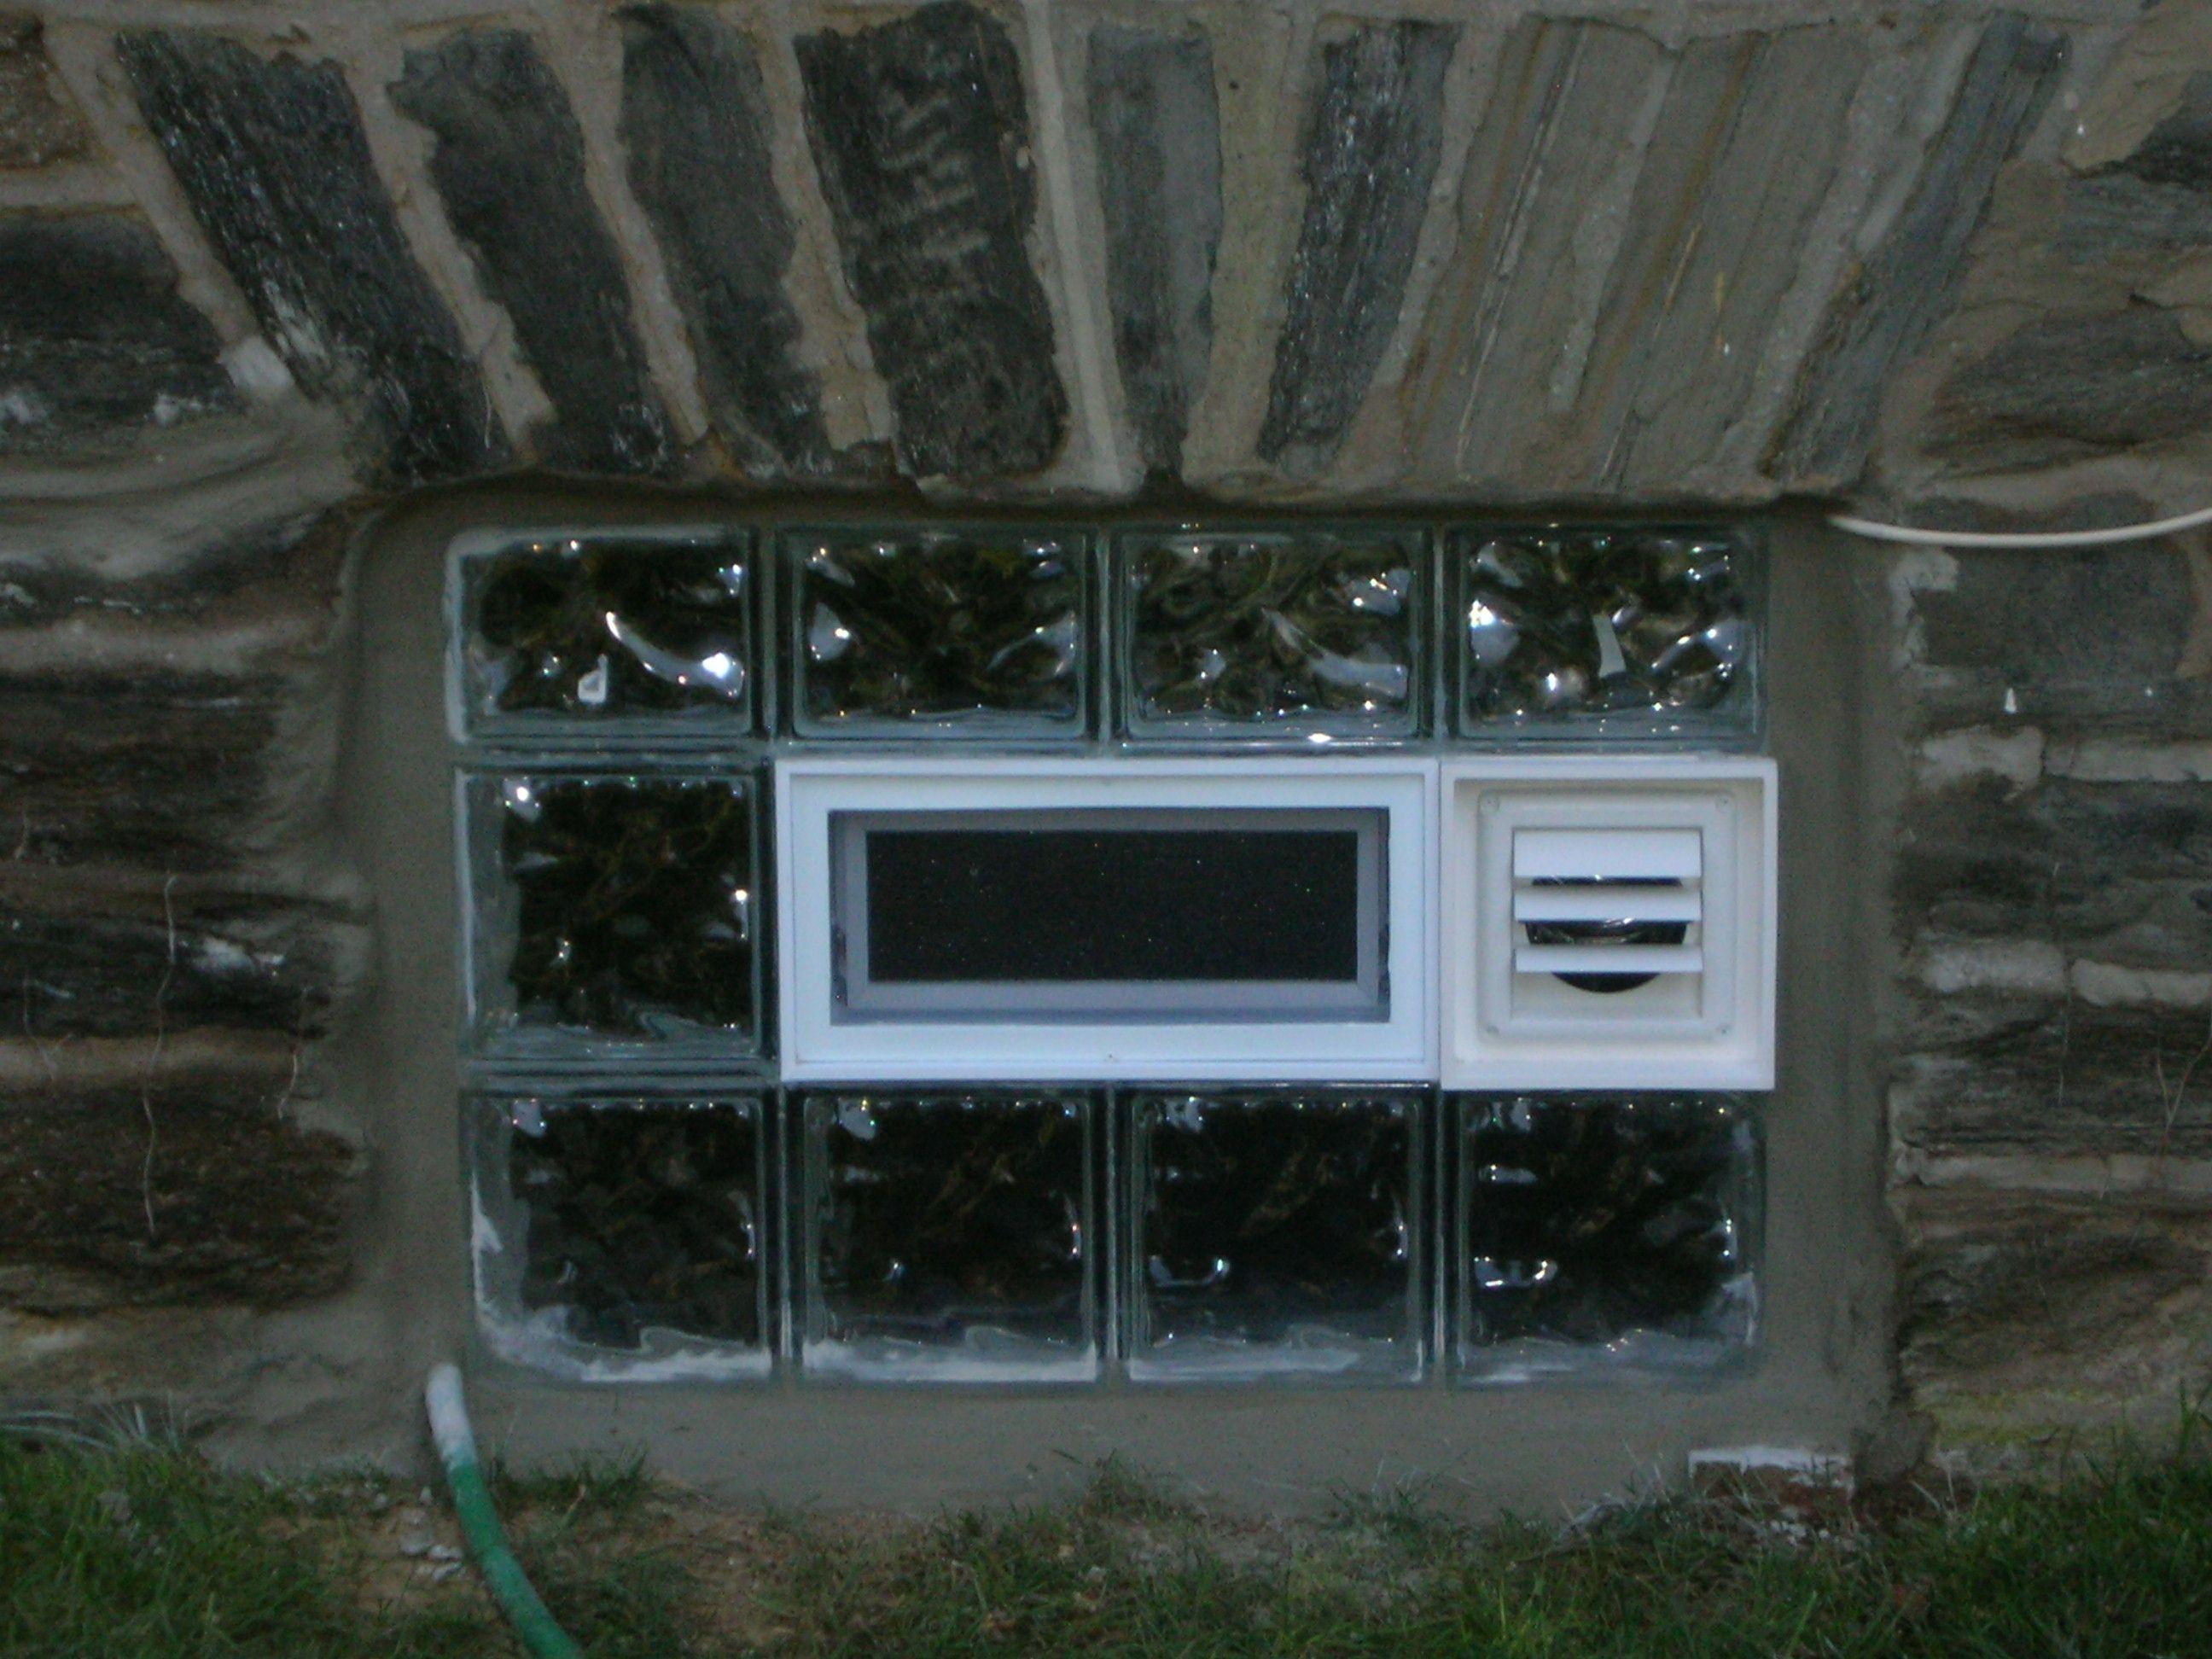 Glass Block Basement Window Dryer Vent Glass Block Basement Windows Basement Windows Dryer Vent